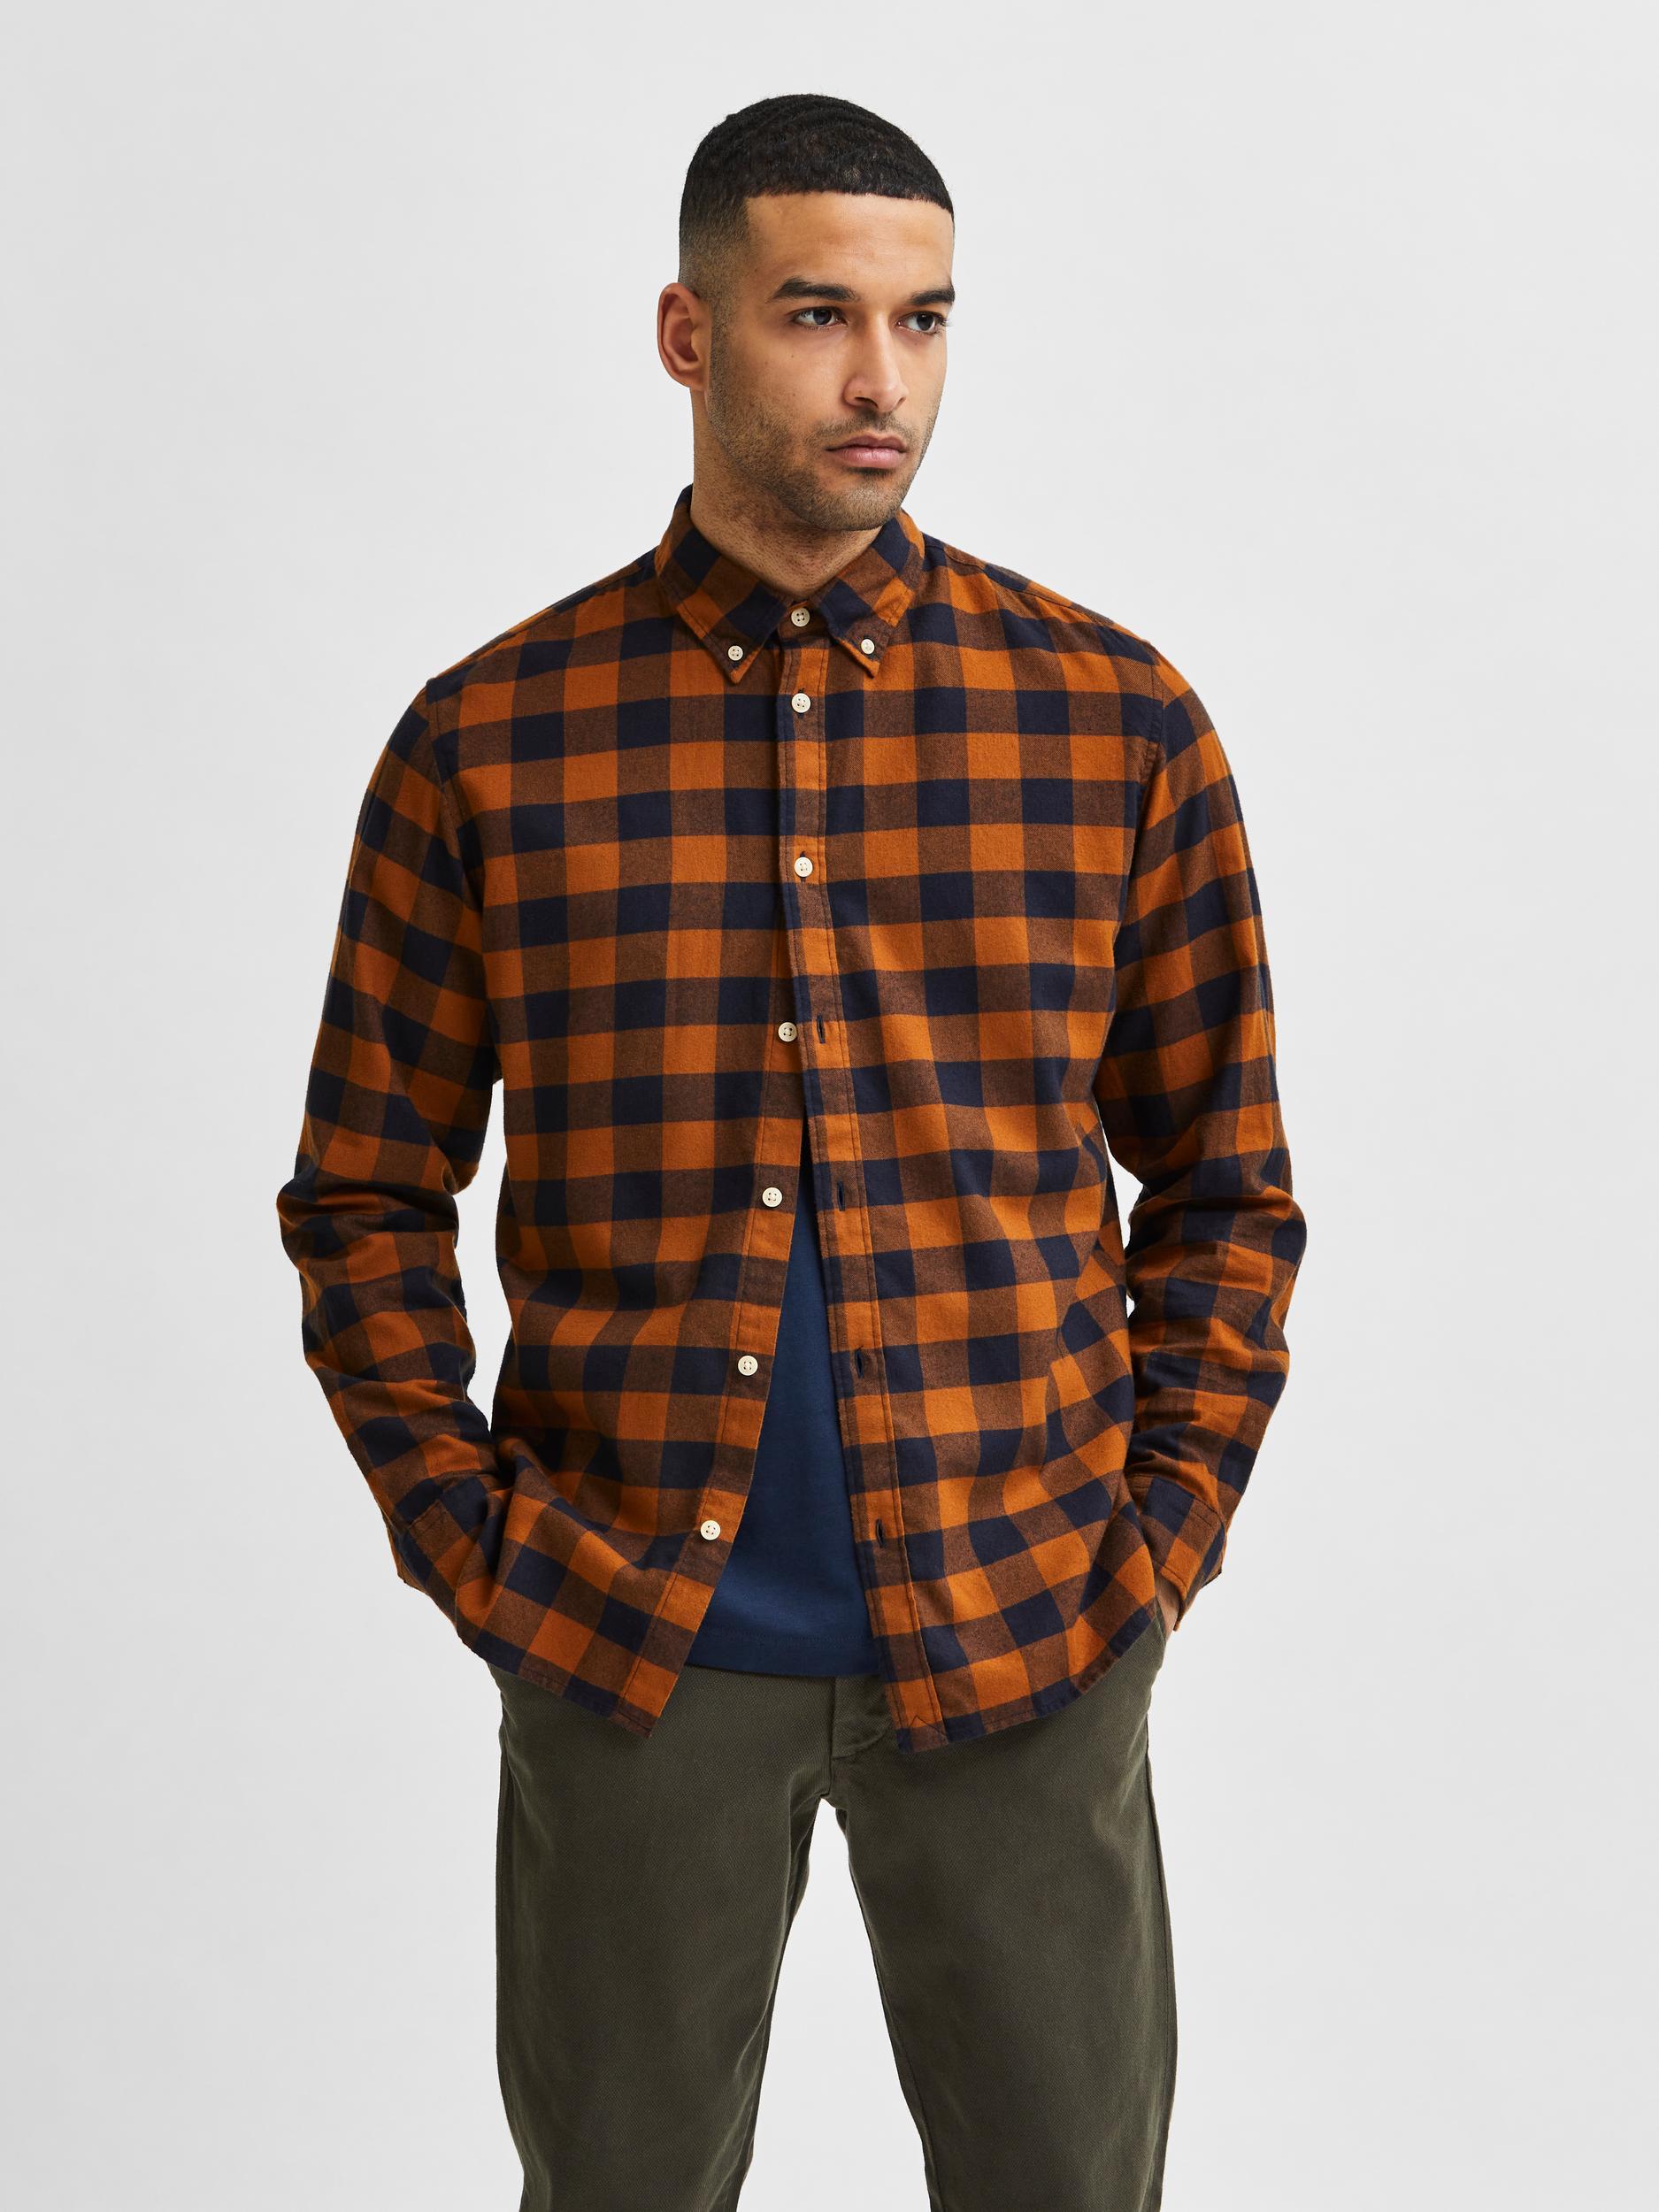 Selected Homme Flannel Slim skjorte, monks robe, x-large